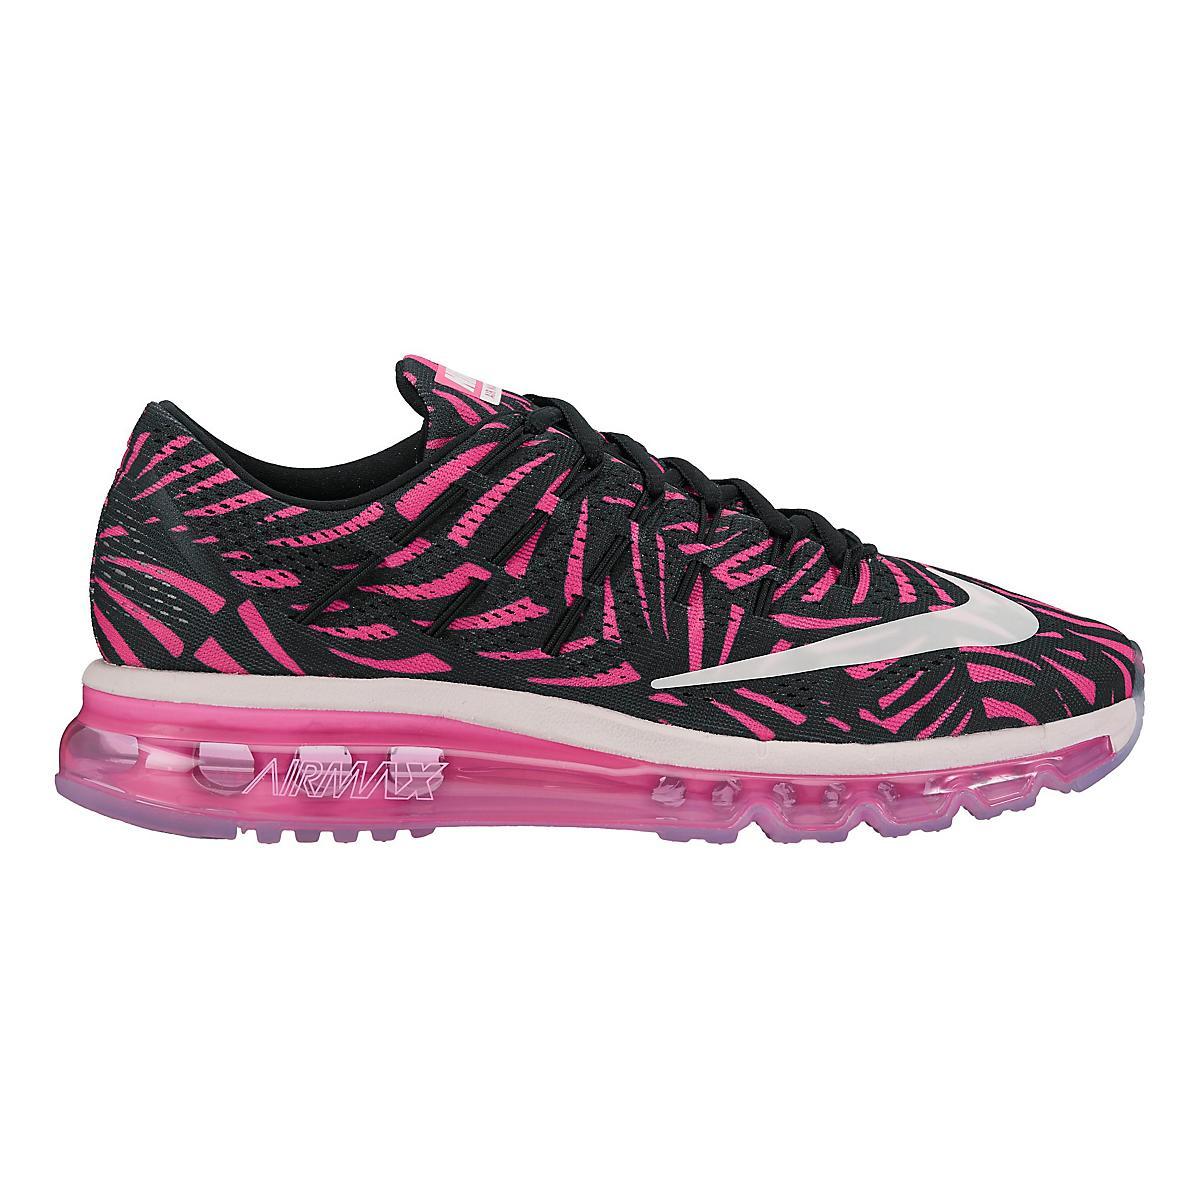 cheaper 6ad30 71821 Womens Nike Air Max 2016 Print Running Shoe at Road Runner S